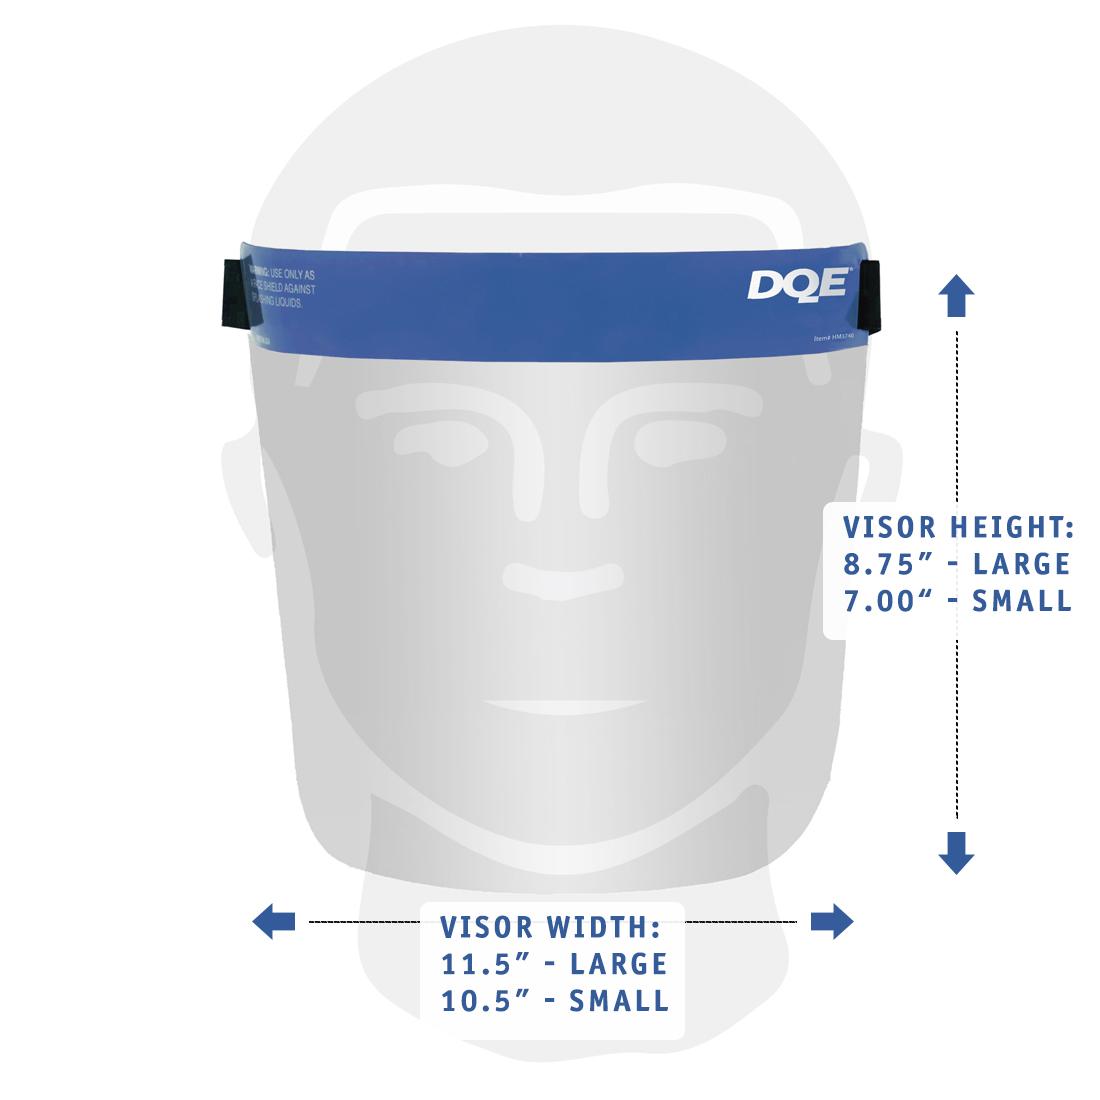 Reusable Face Shield Dimensions image